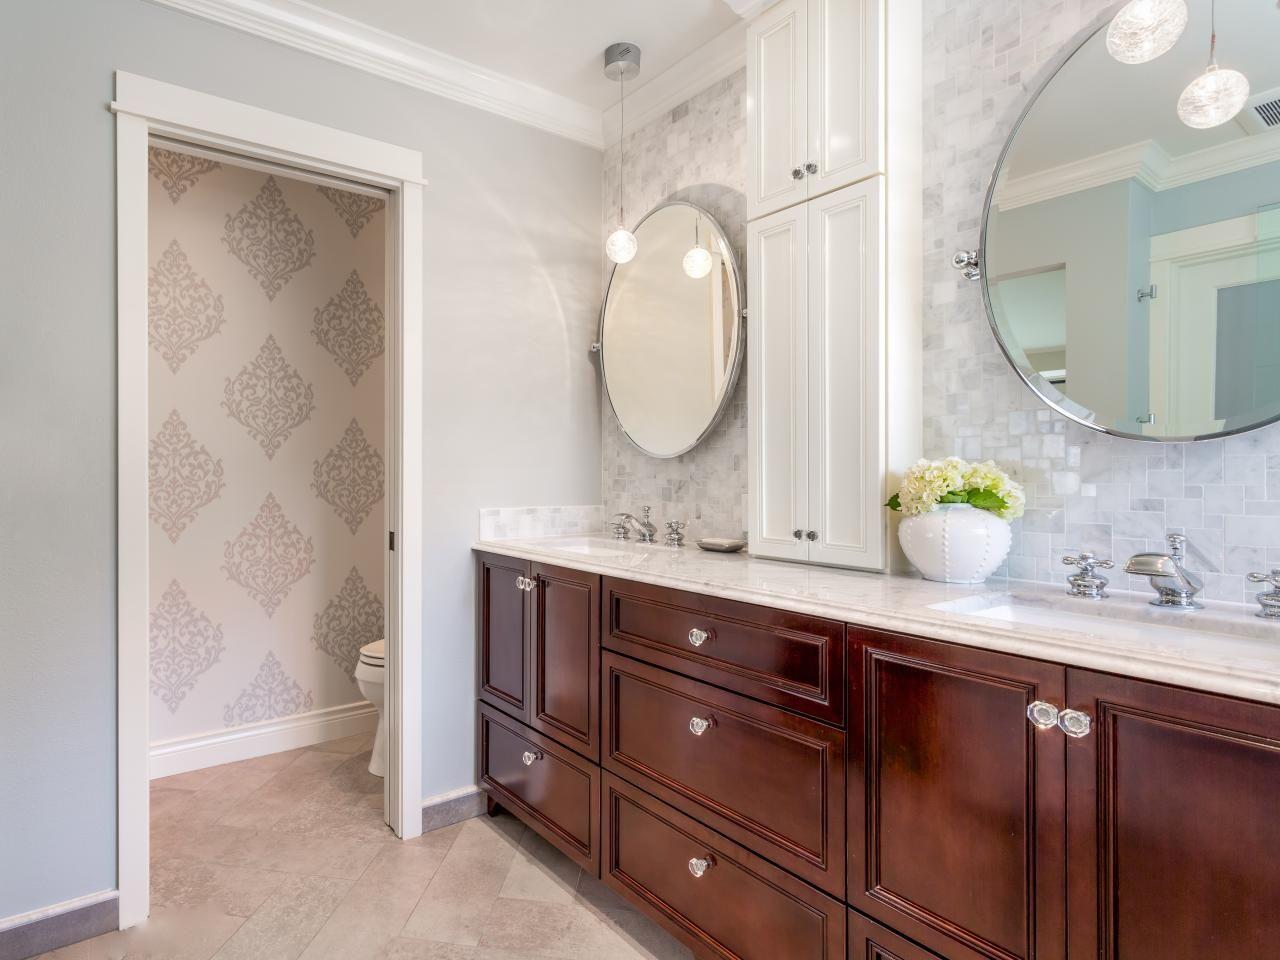 Merveilleux Transitional Master Bathroom With Spacious Cherry Wood Vanity | HGTV